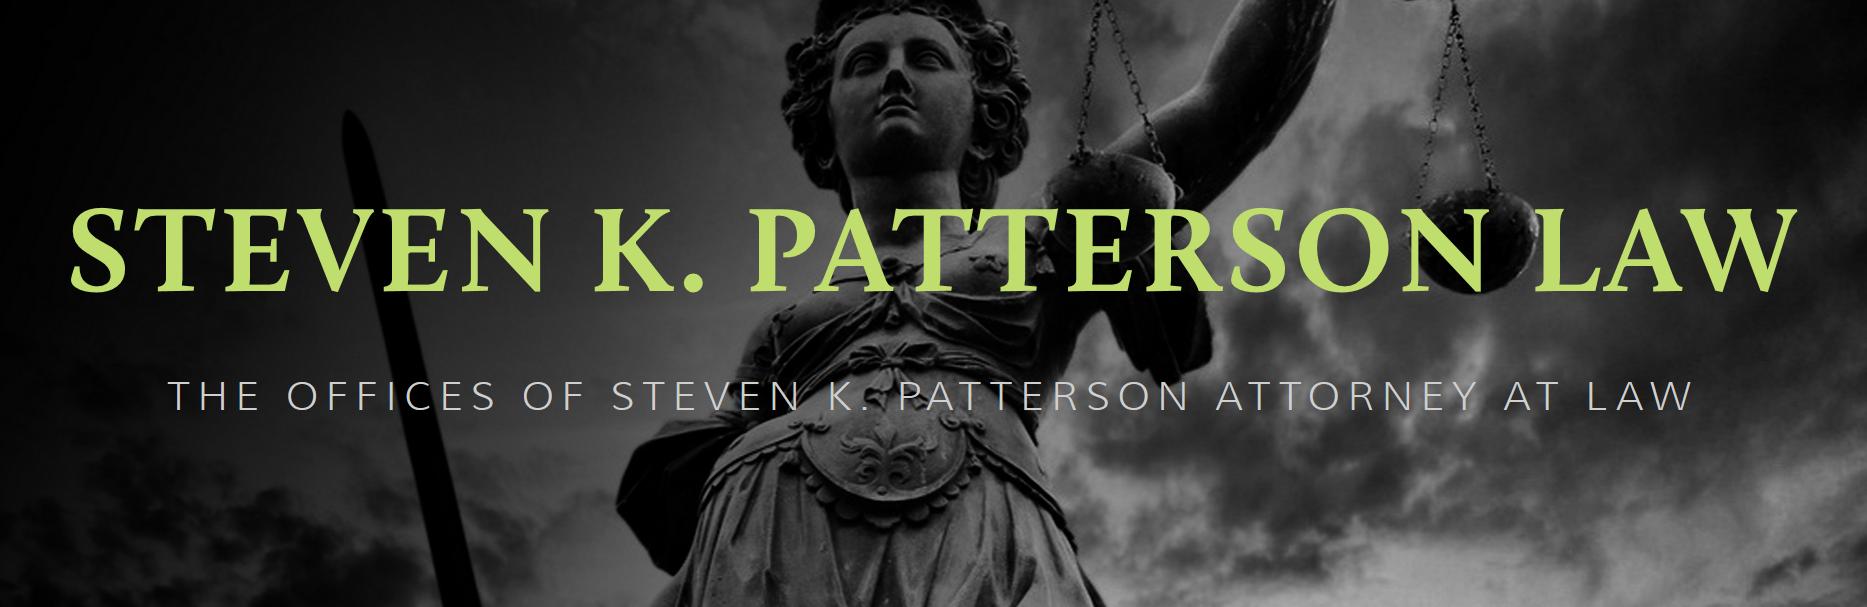 Steven K. Patterson